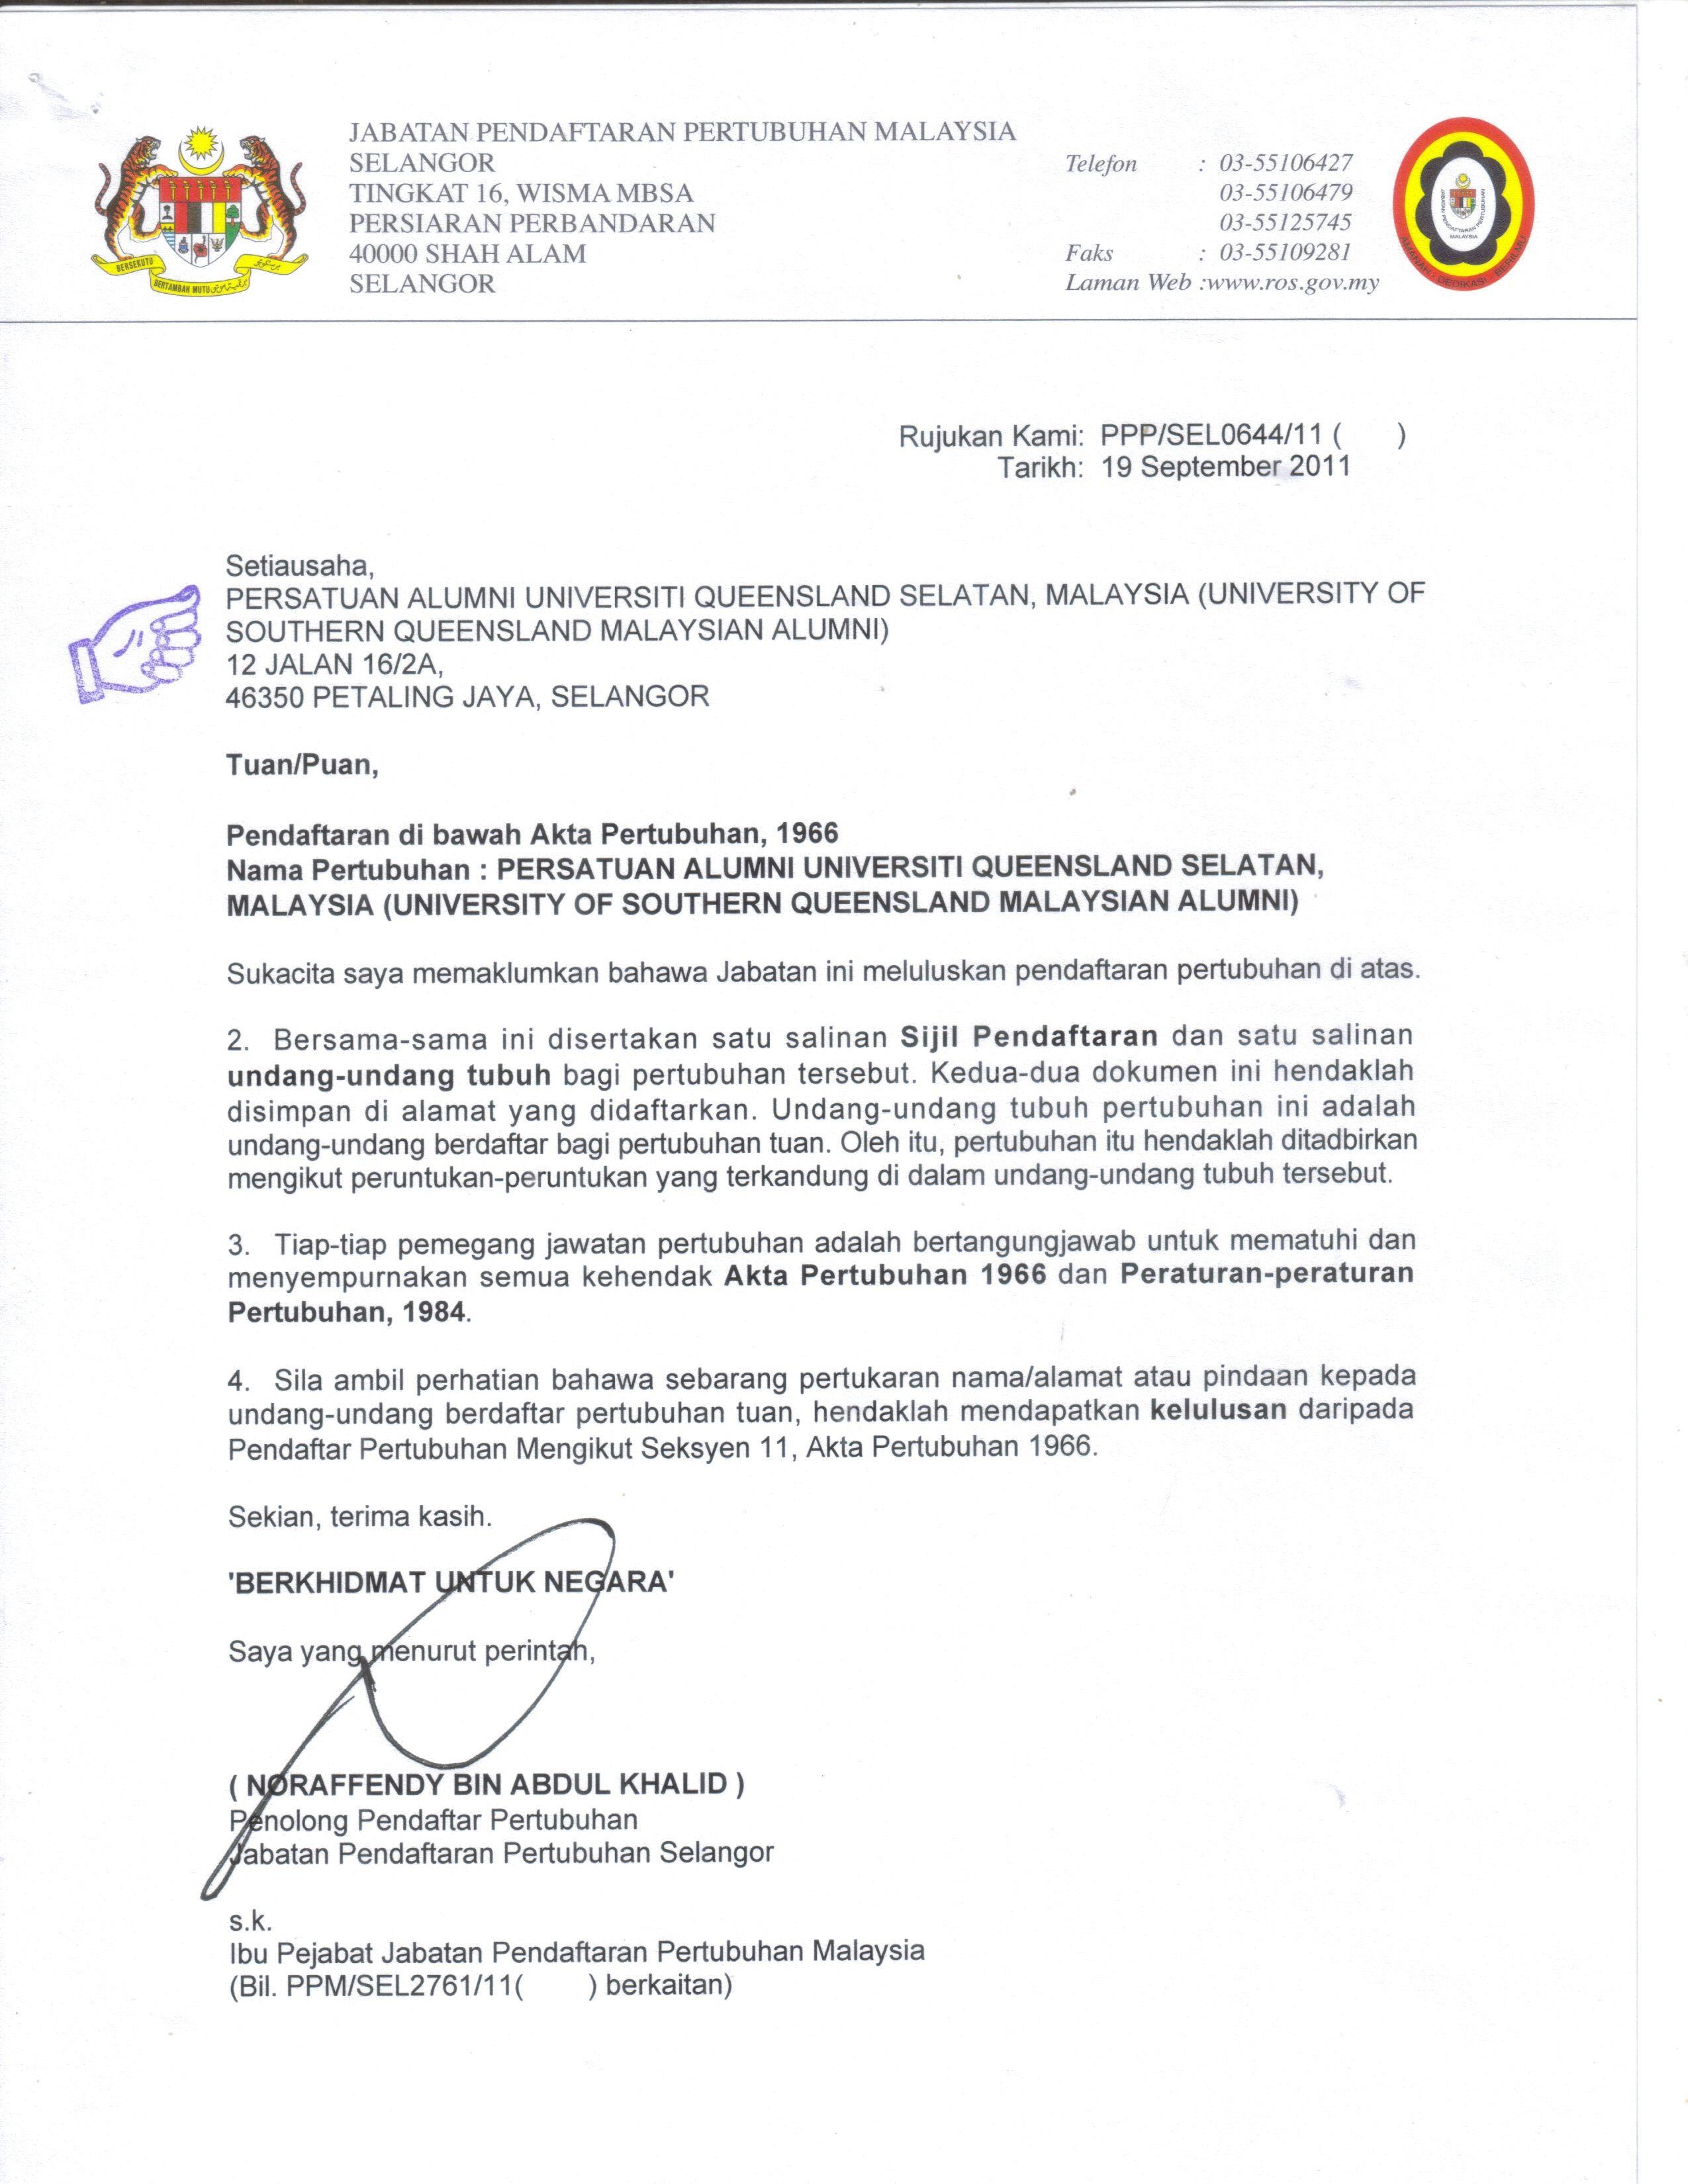 Authorization letter malay usq malaysian alumni ros bahasa authorization letter malay usq malaysian alumni ros bahasa malaysia cover templates cover templatemalaysia spiritdancerdesigns Image collections